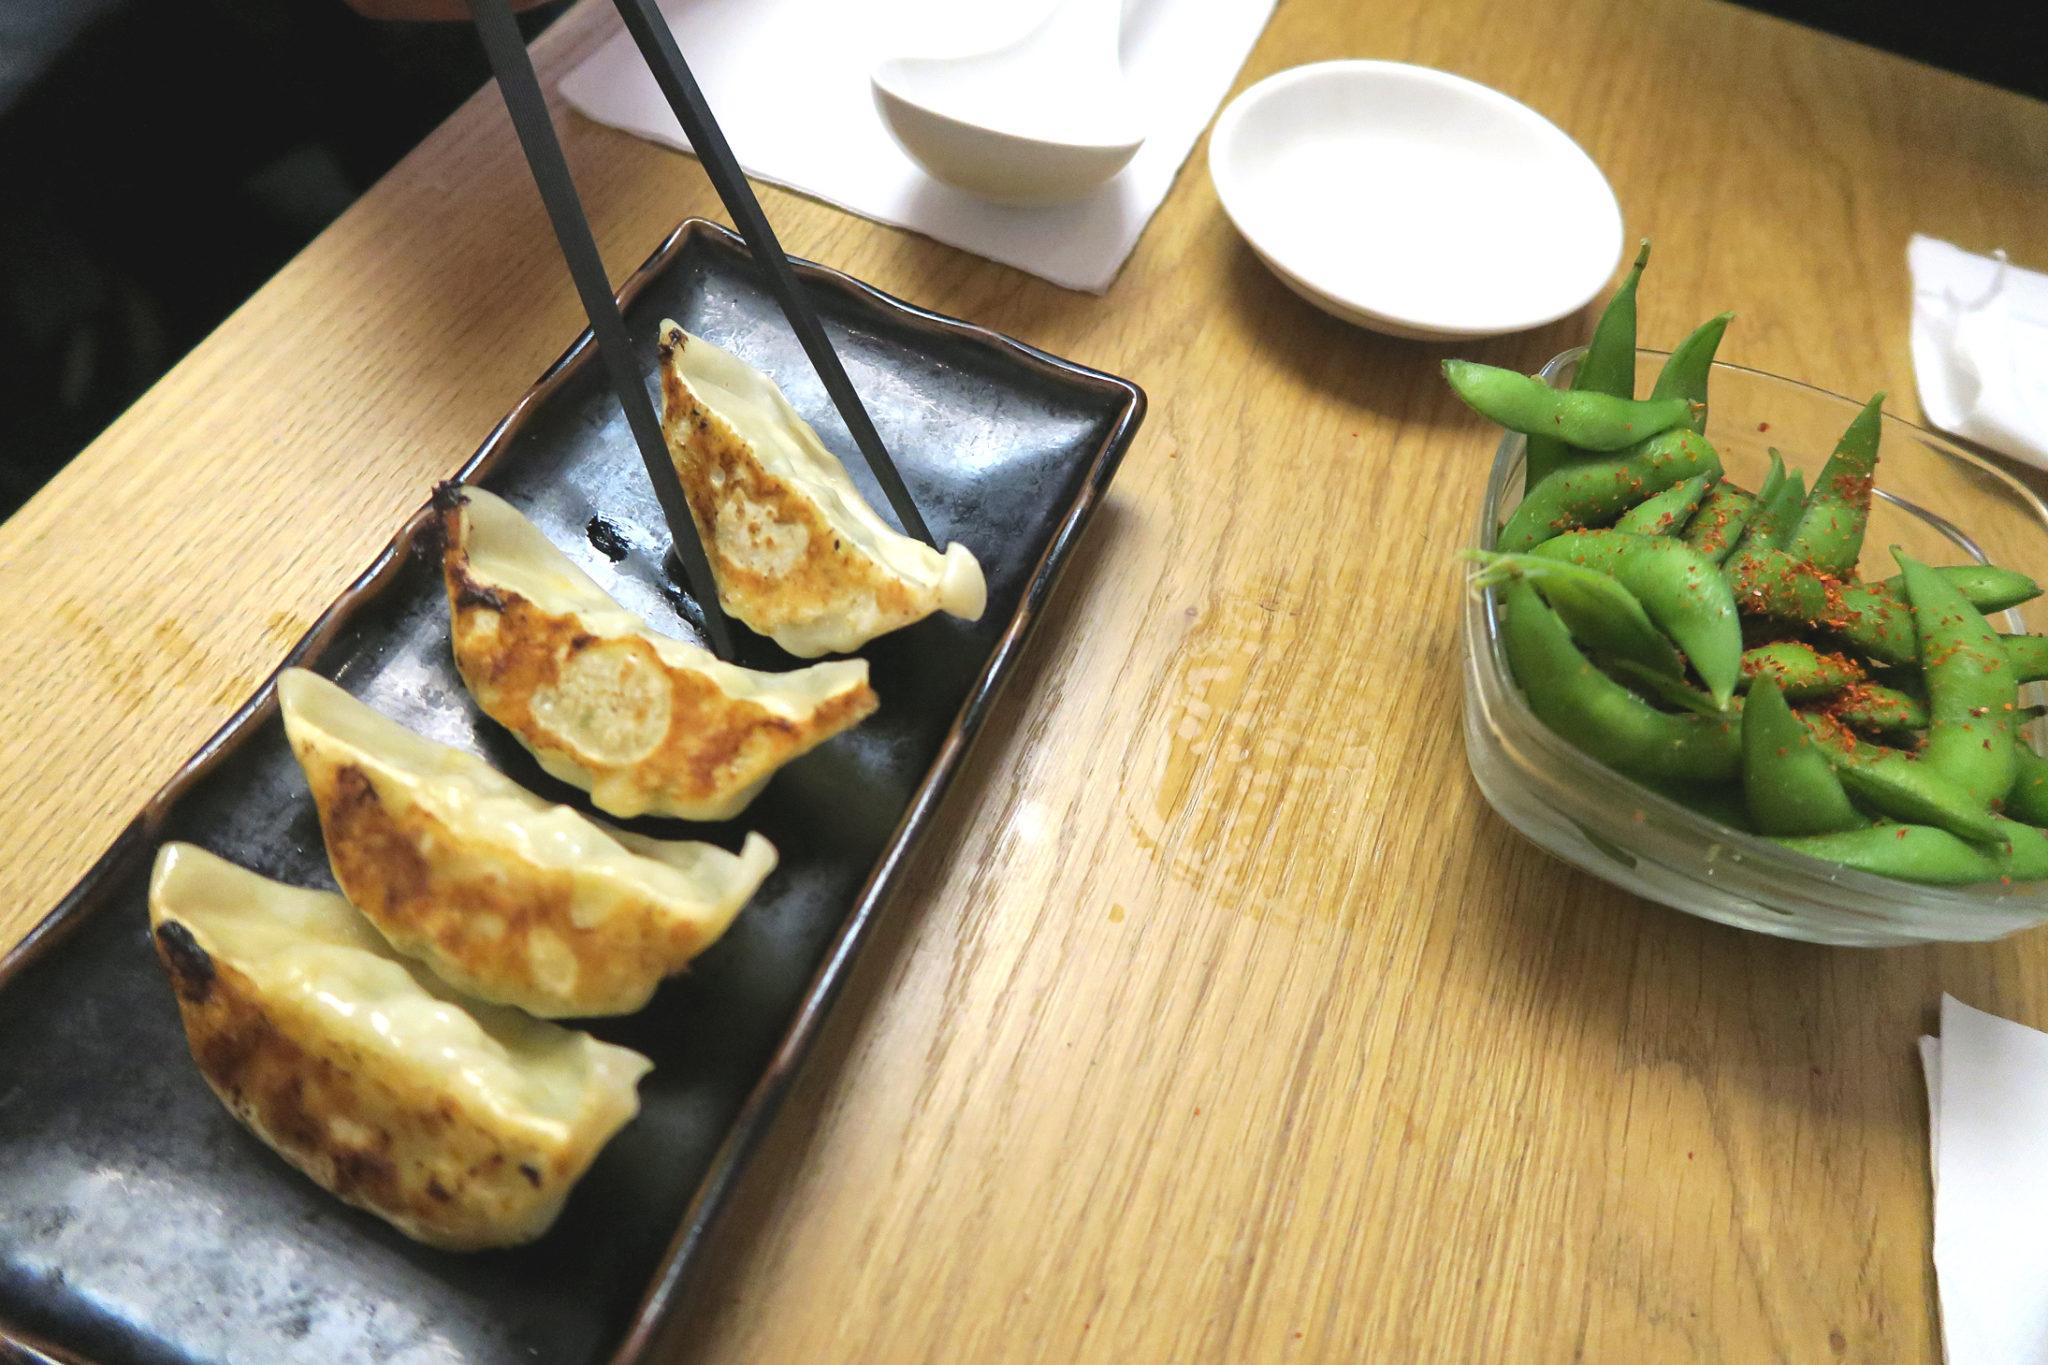 Hema_Dosanko_larmen_ravioles_paris_restaurant_japonais_cuisine_monde